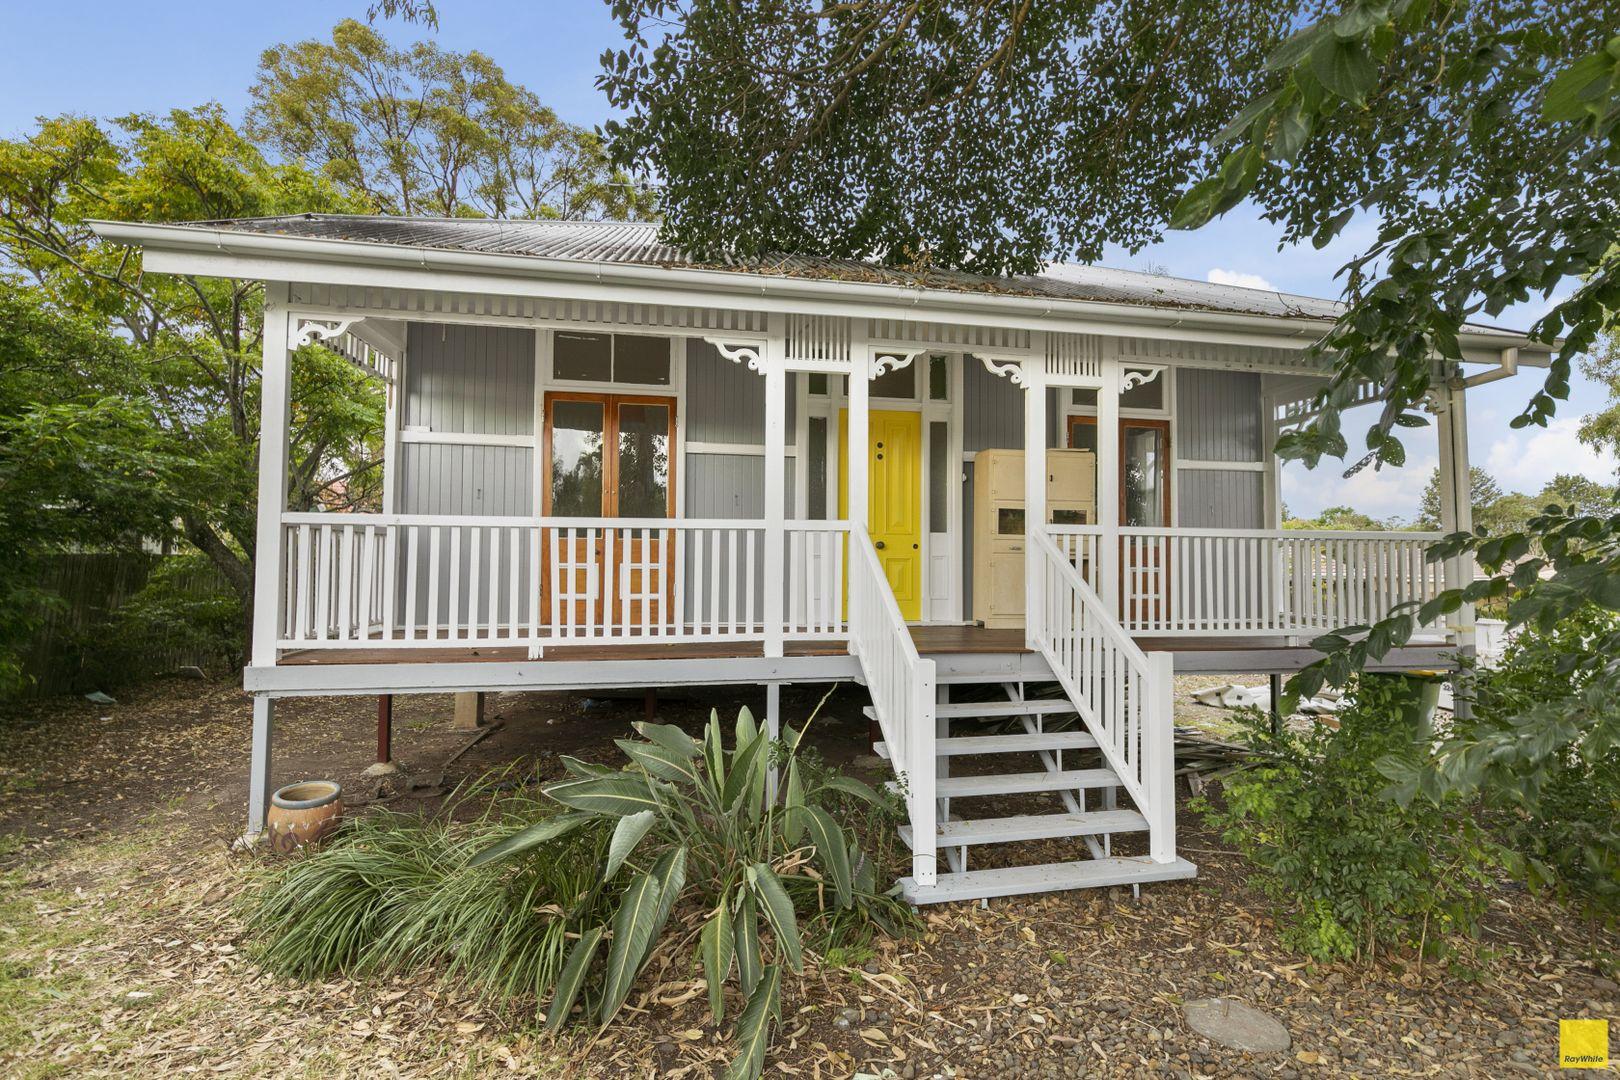 68 Collingwood Road, Birkdale QLD 4159, Image 0